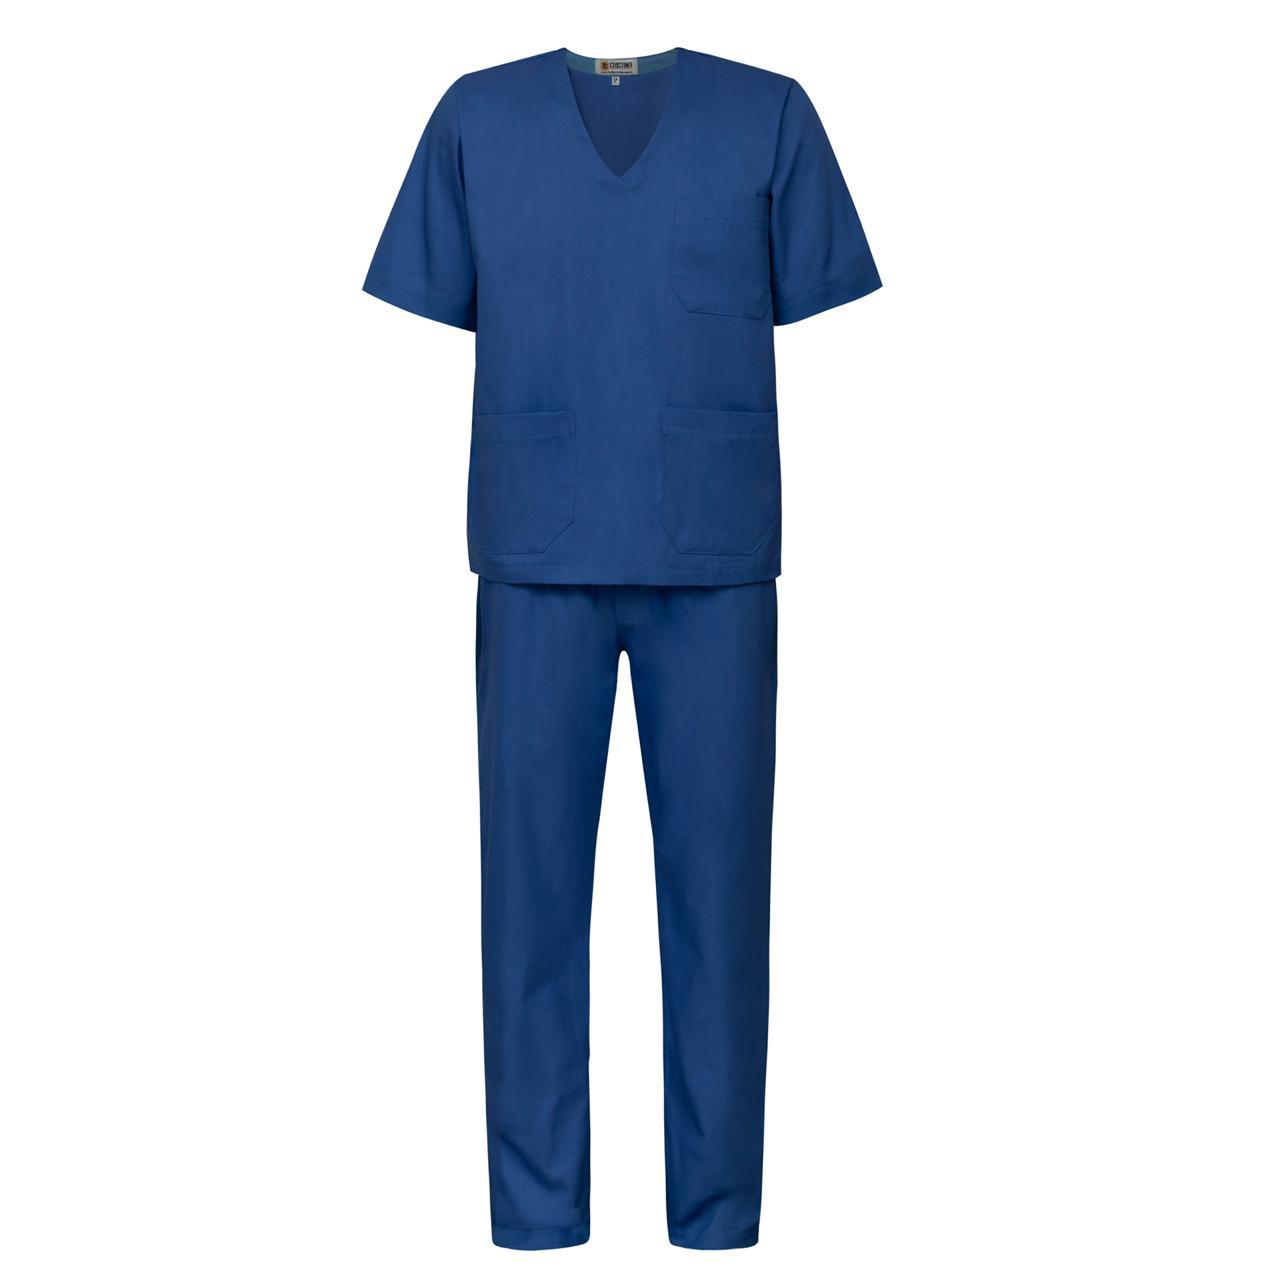 Scrub / Pijama Cirúrgico Gola V Unissex - Azul Royal